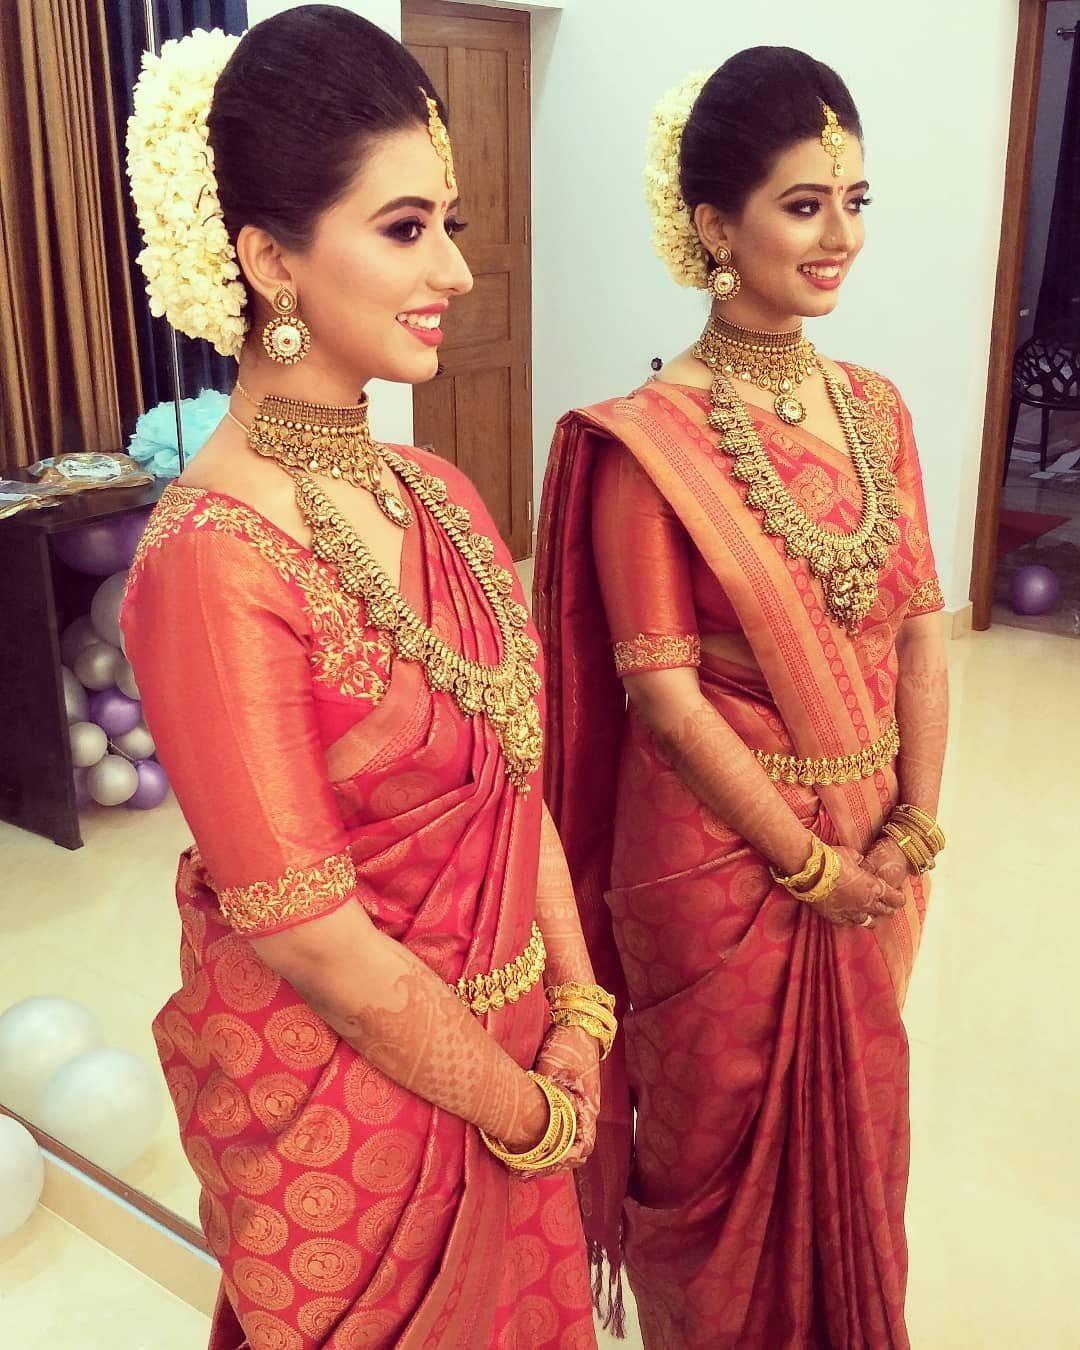 Wedding Sarees For Bride Kerala Hindu: Hindu Wedding Makeup Work In Kerala